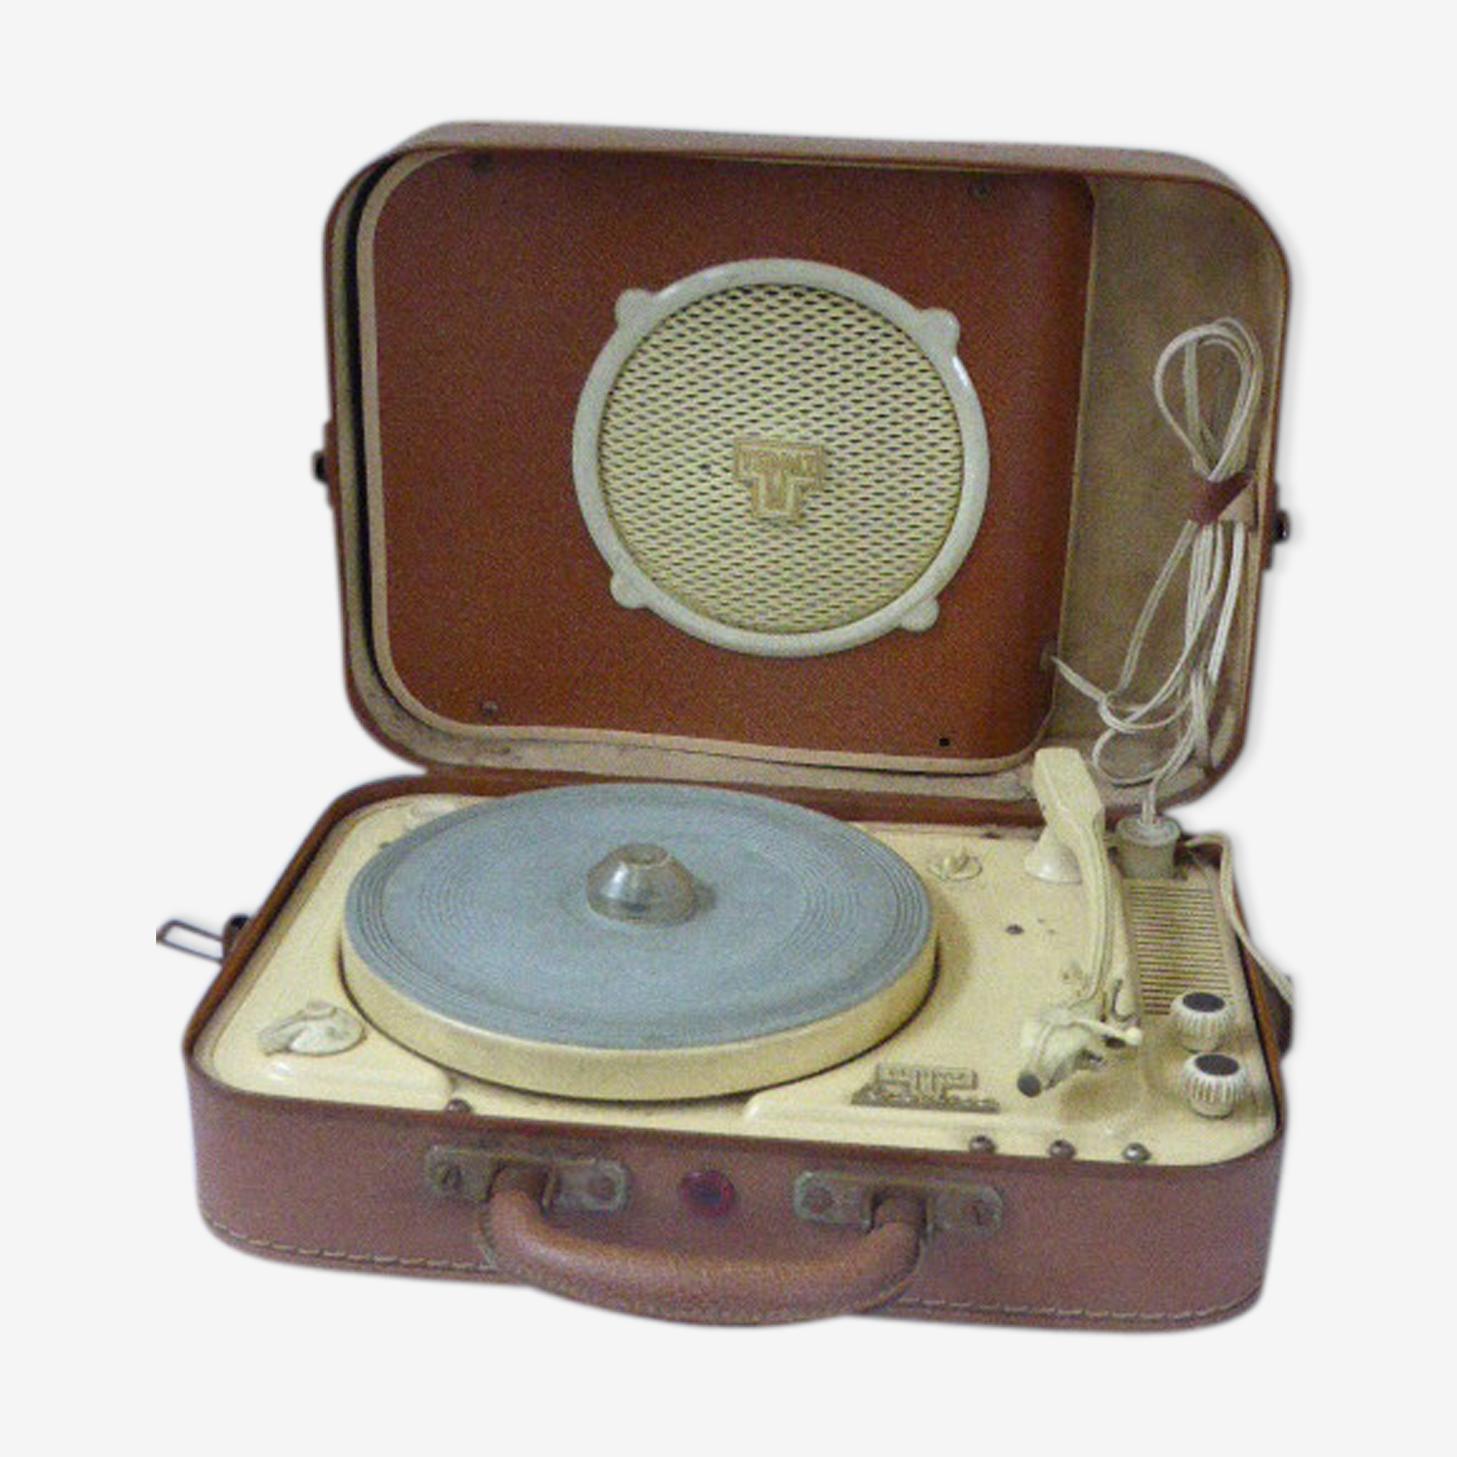 Electrophone portatif Teppaz Présence vintage 1955